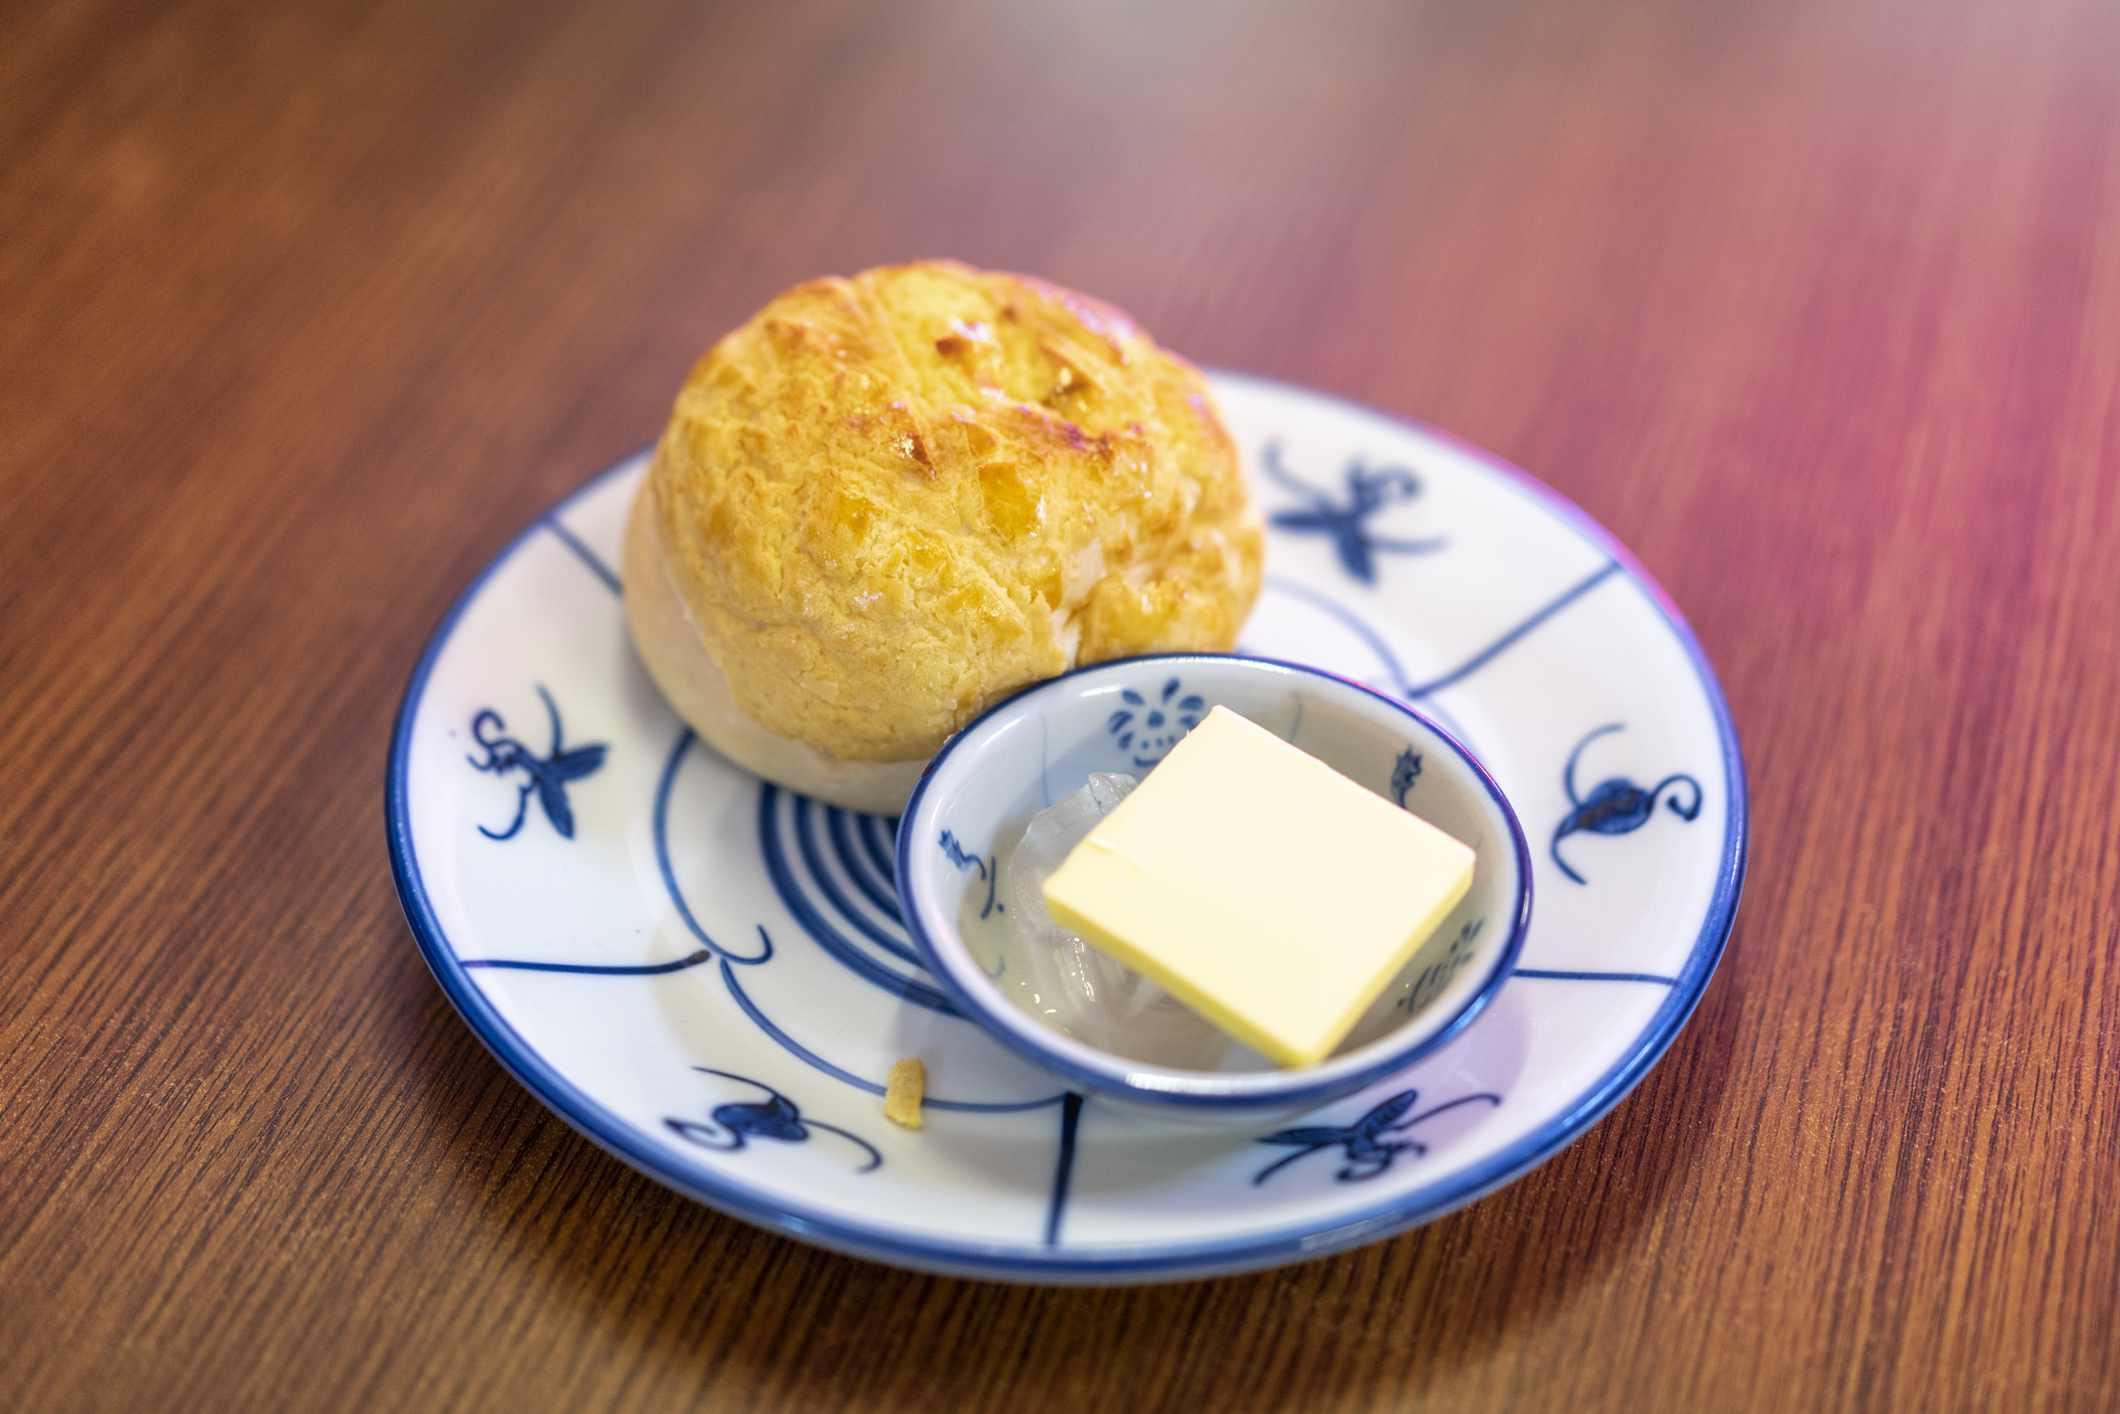 Close-up of Hong Kong cuisine